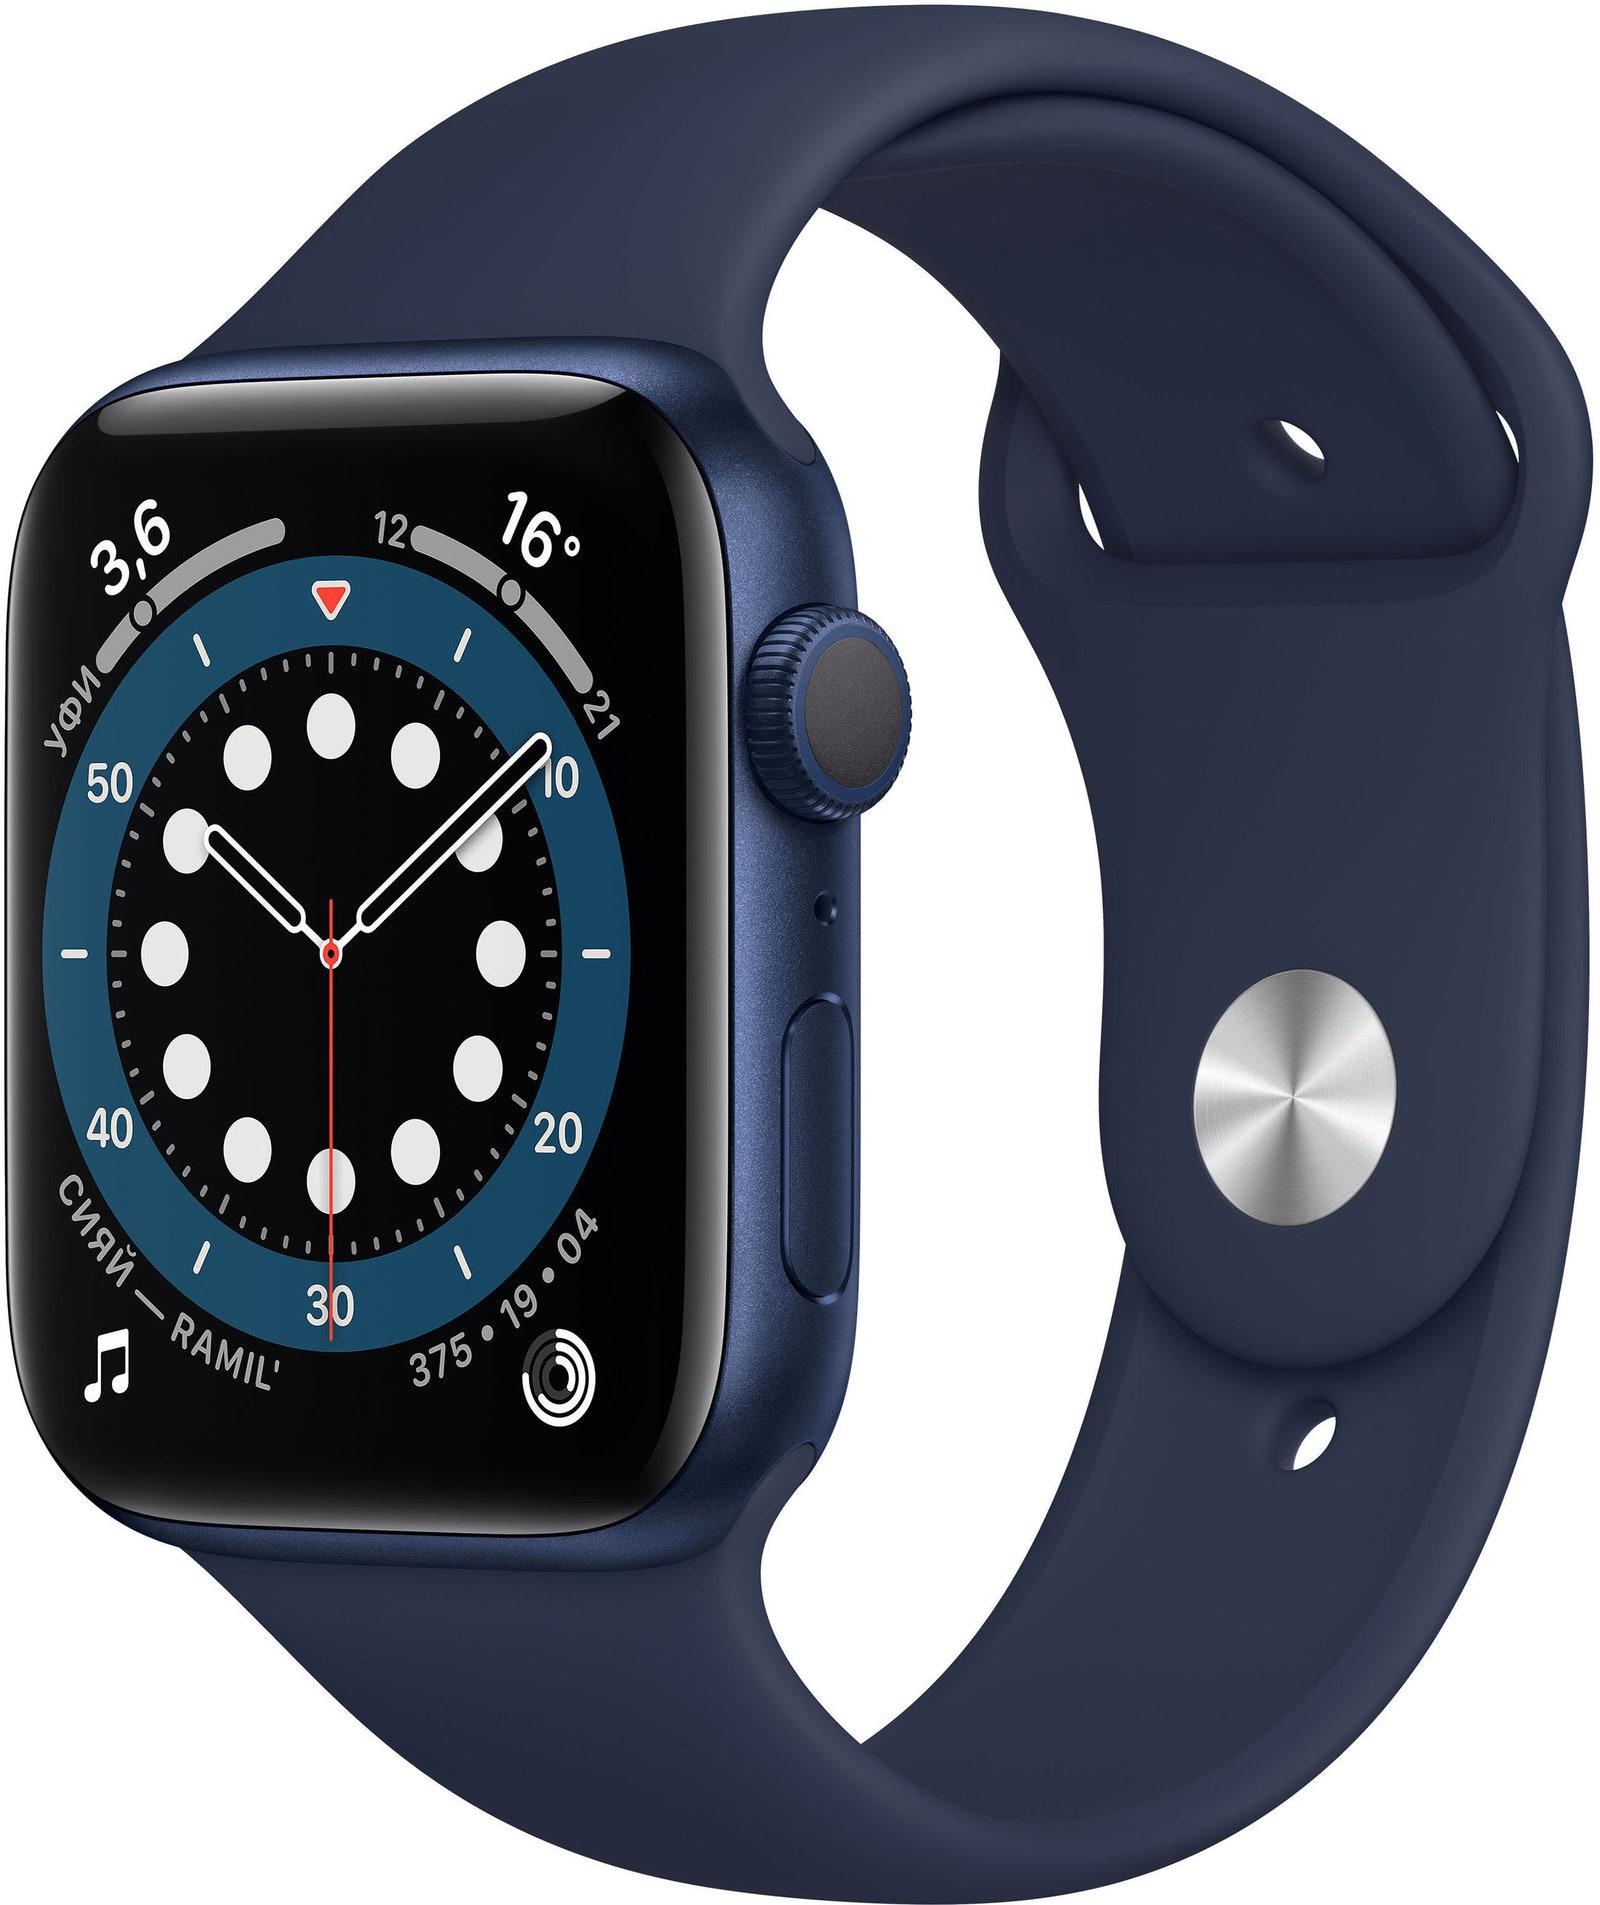 Apple Watch Series 6 39 490 .